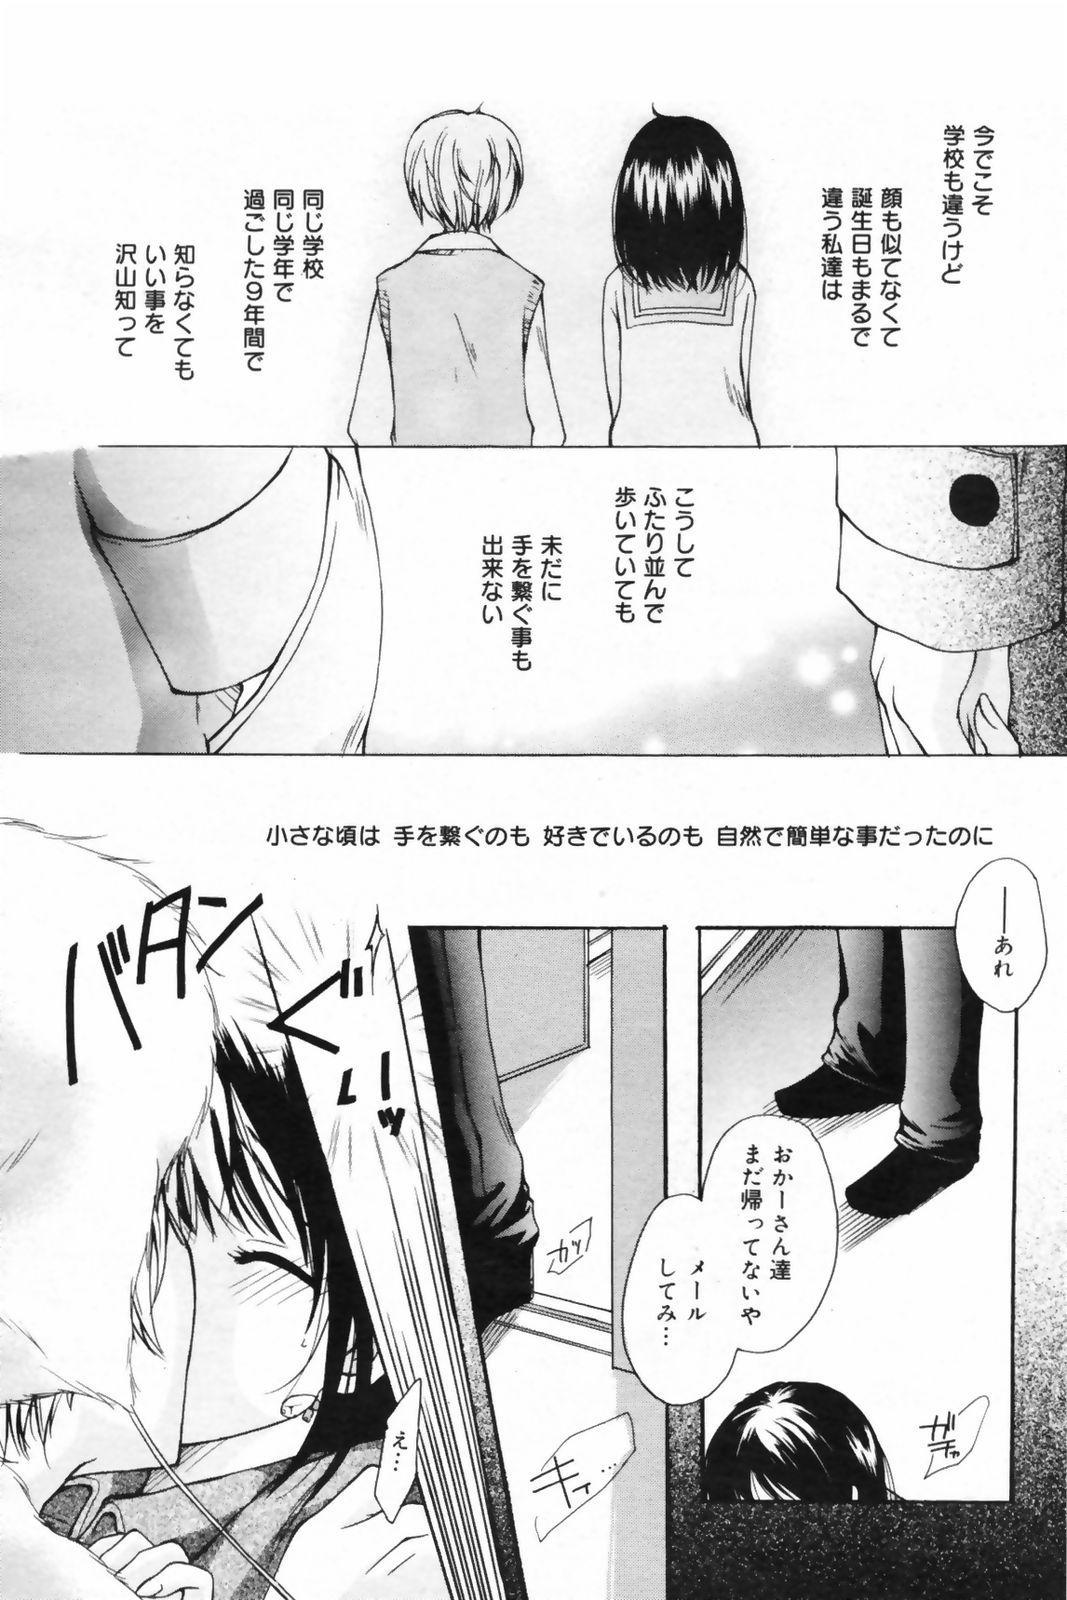 Manga Bangaichi 2009-02 Vol. 234 124